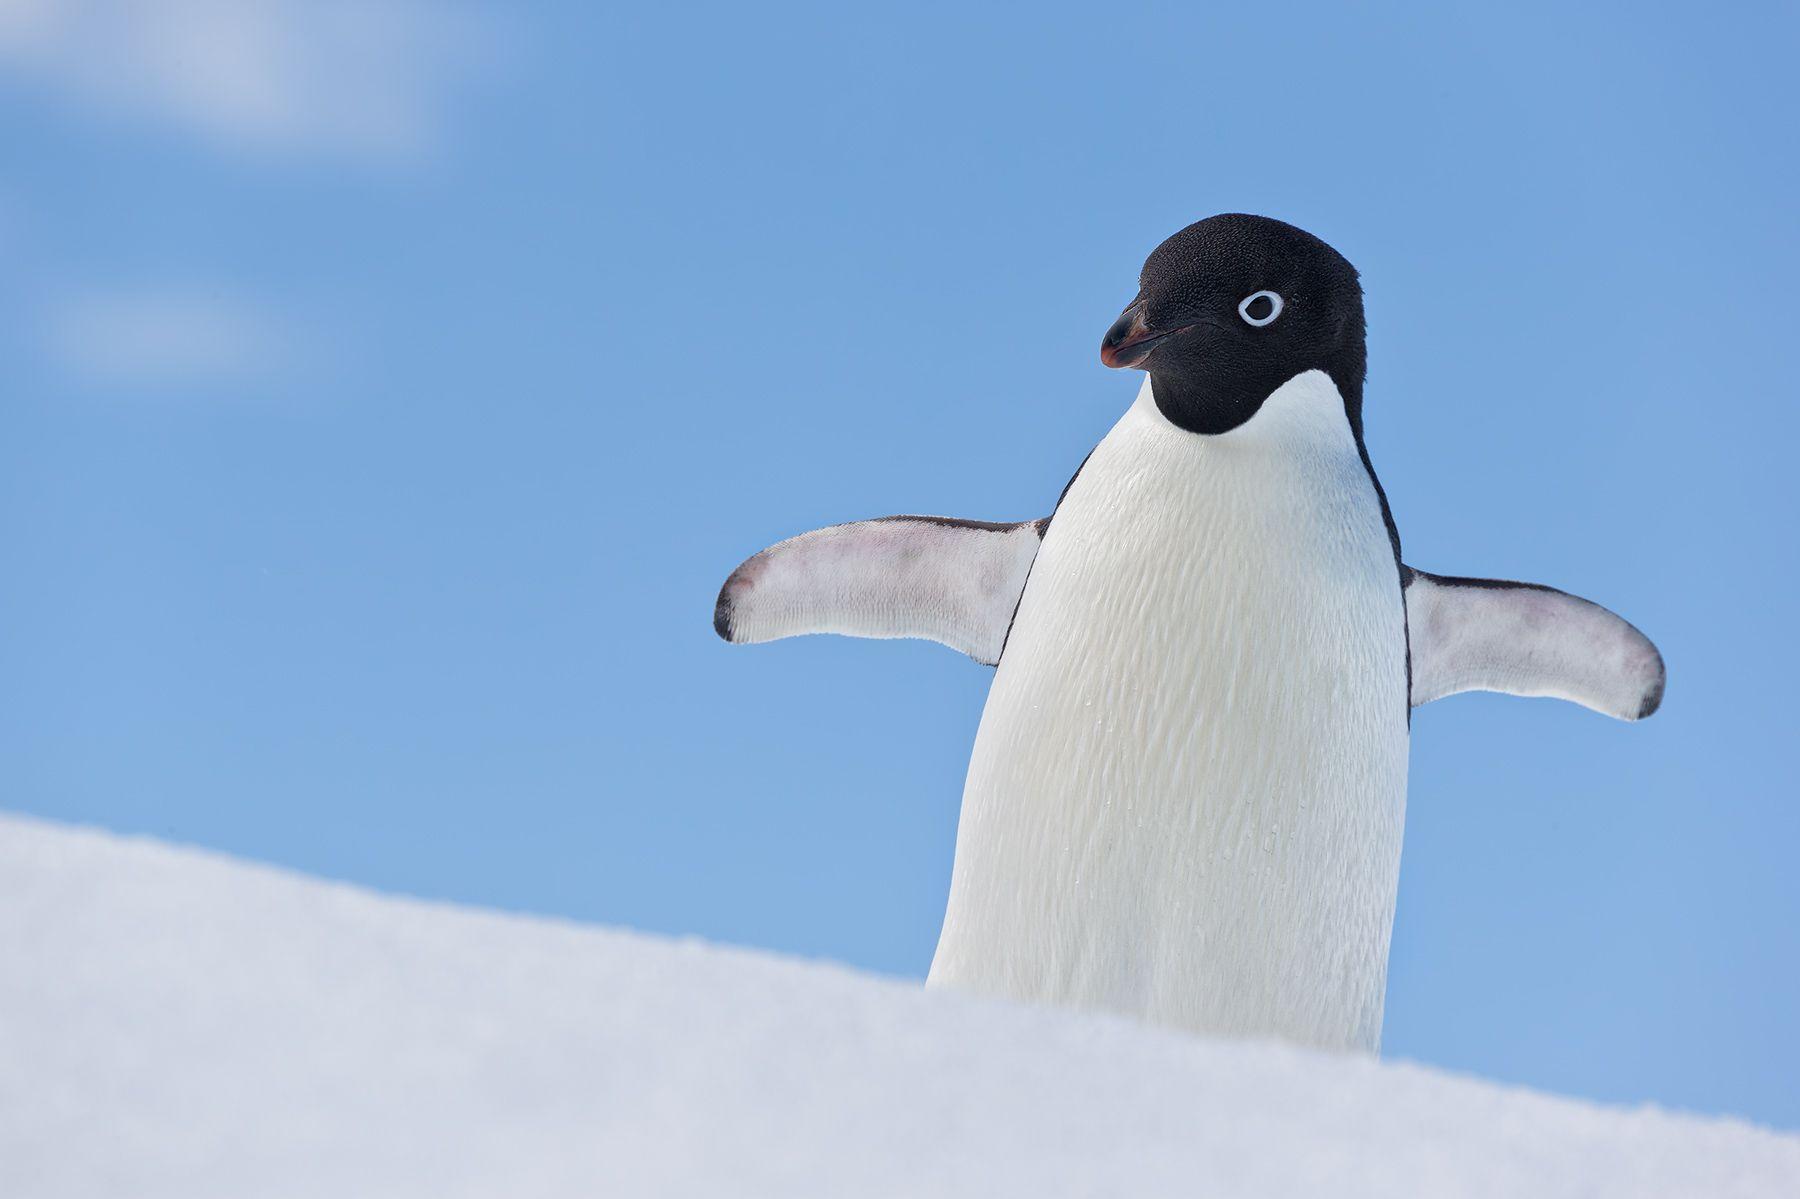 Adelie-Penguin-on-iceberg-with-blue-sky_E7T1593-Detaille-lsland,-Antarctica.jpg